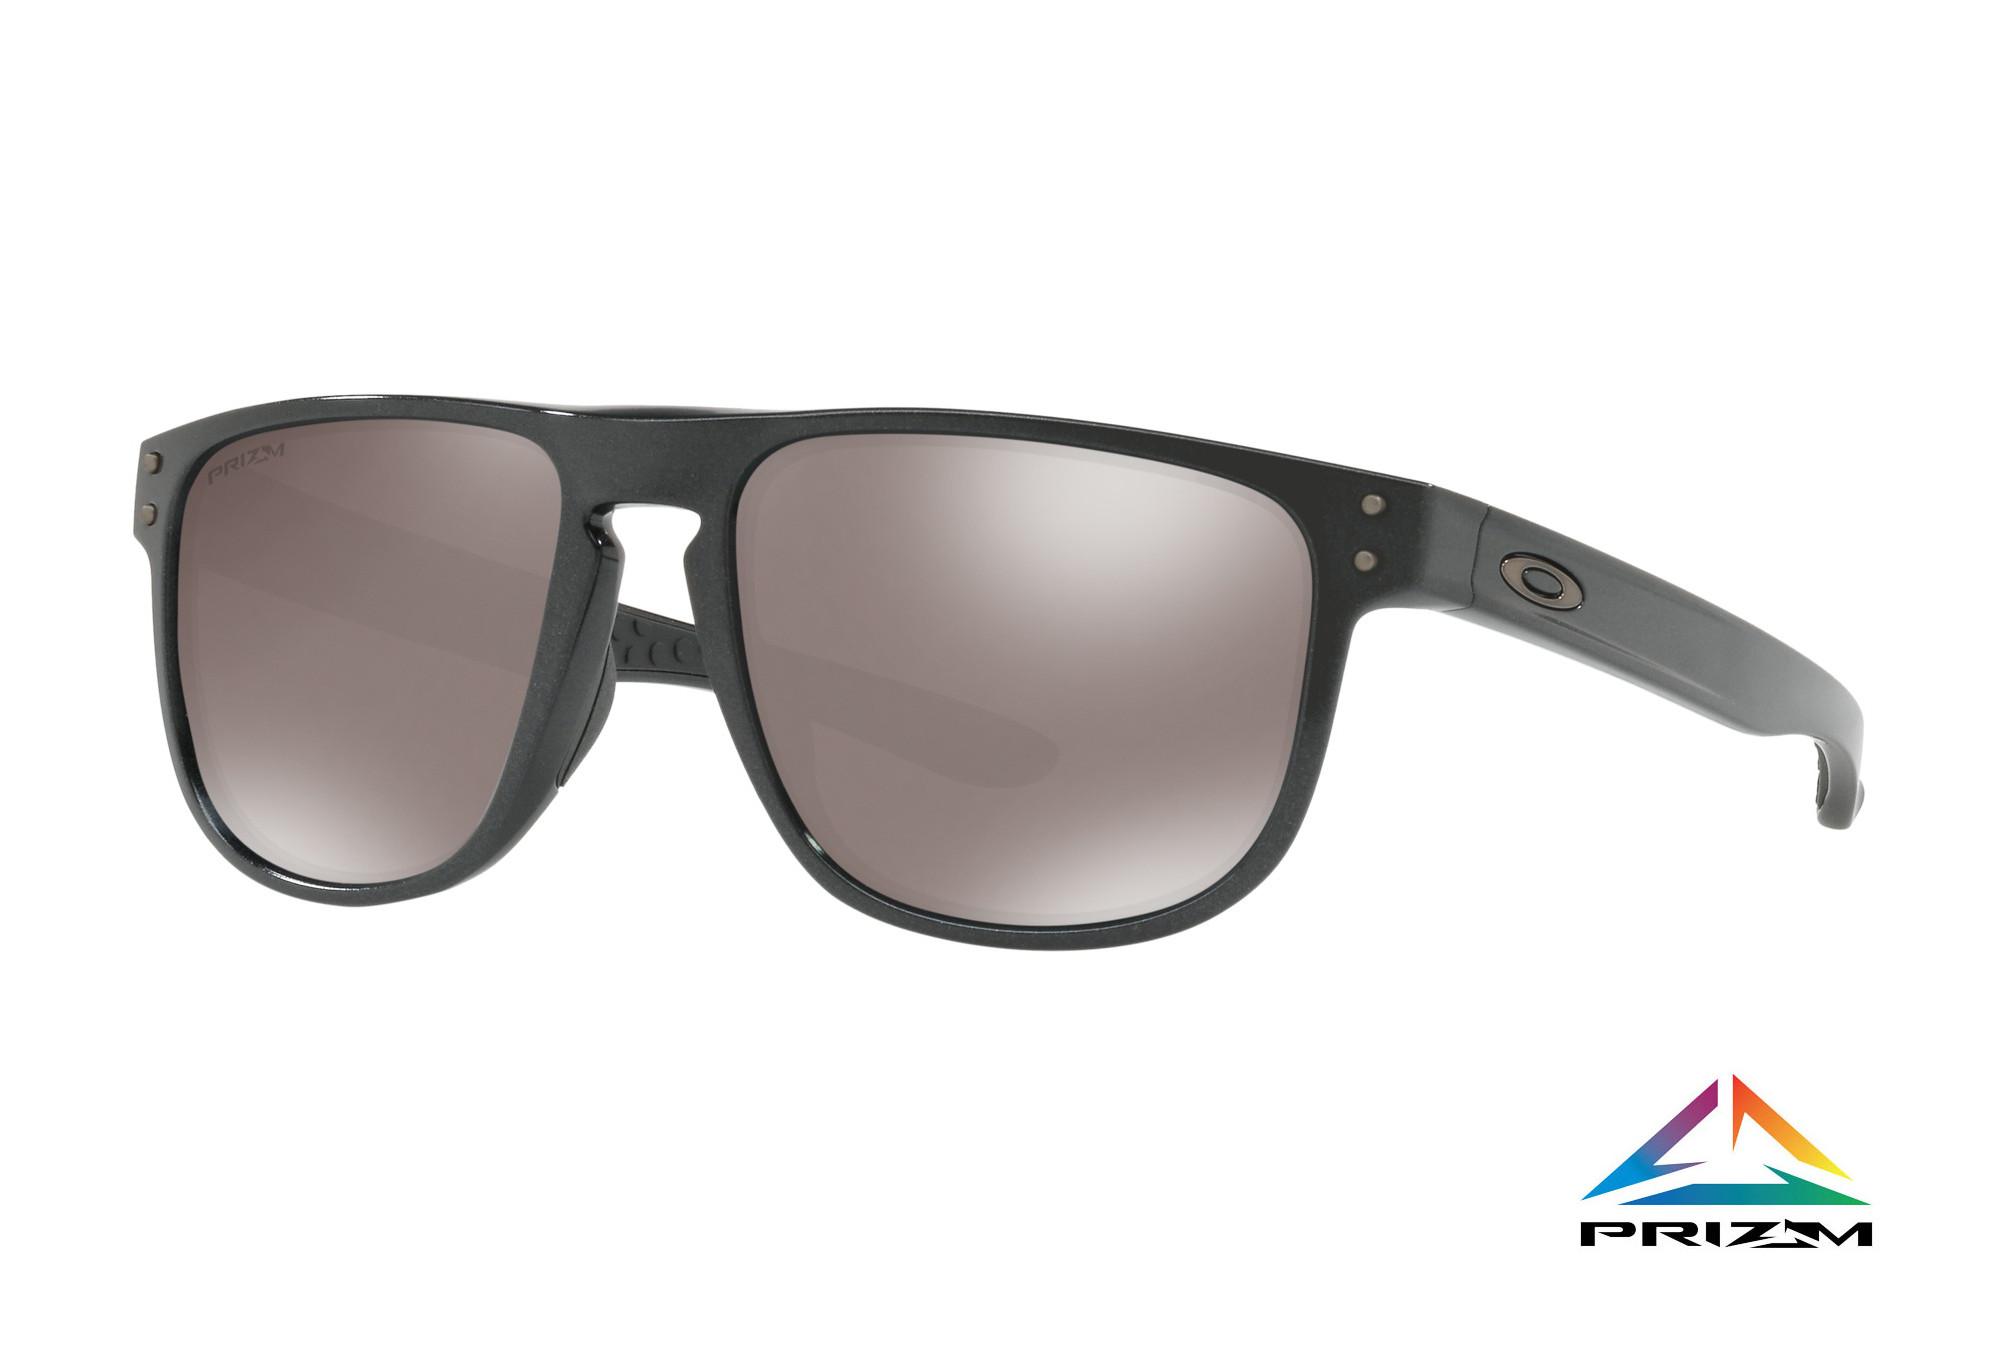 d9bcf57c12 OAKLEY Sunglasses Holbrook R Grey - Prizm Black Polarized Ref OO9377-0855 |  Alltricks.com